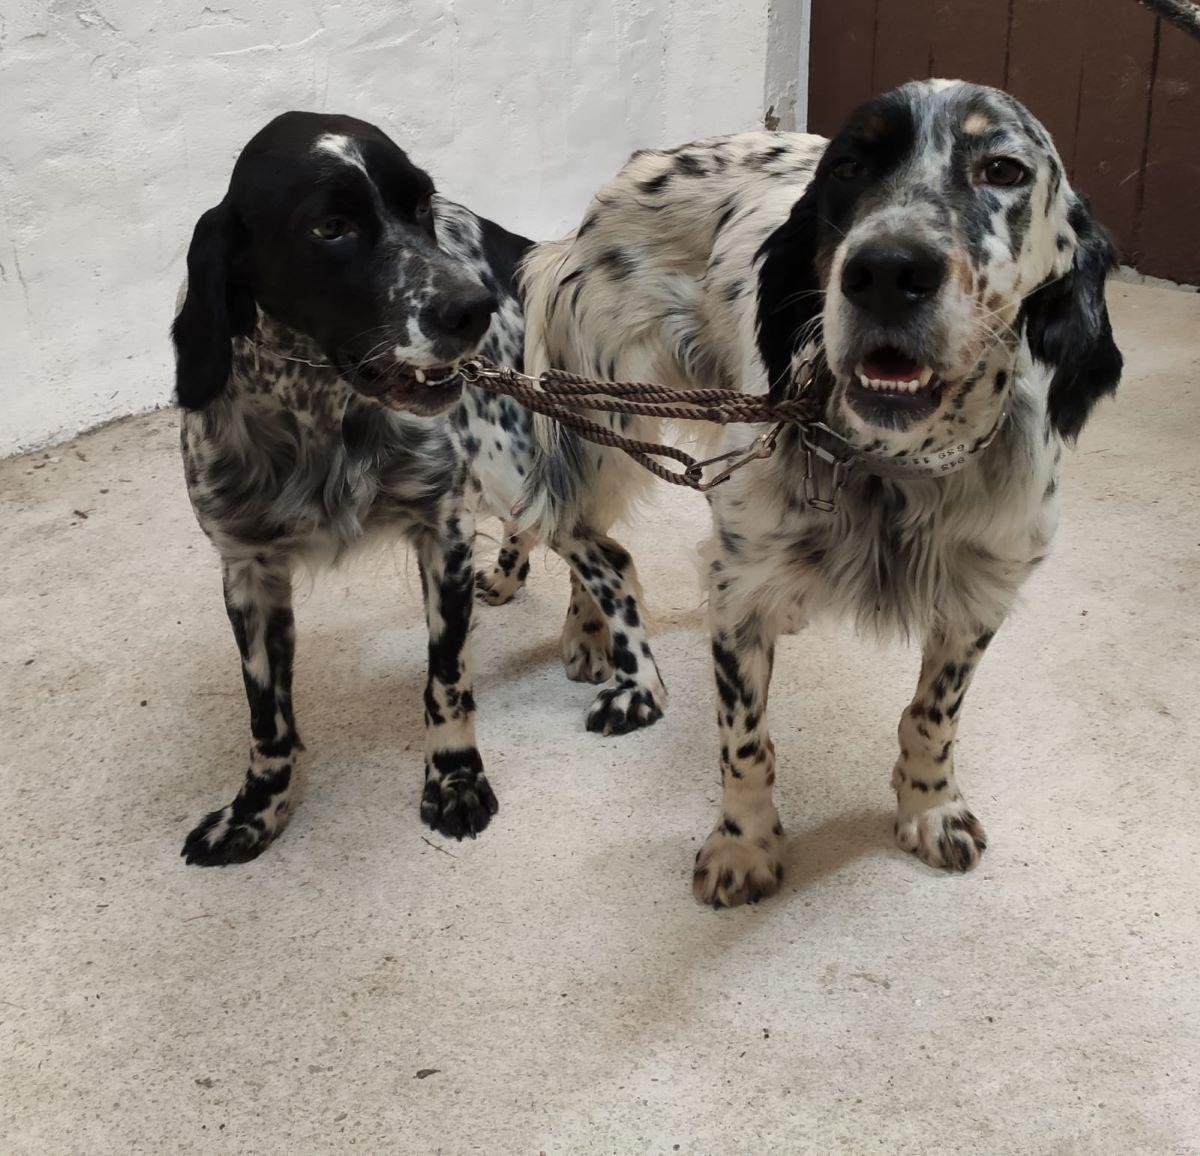 irimendisetter-caza-ehiza-becadas-oilagorrak-cachorros-perros